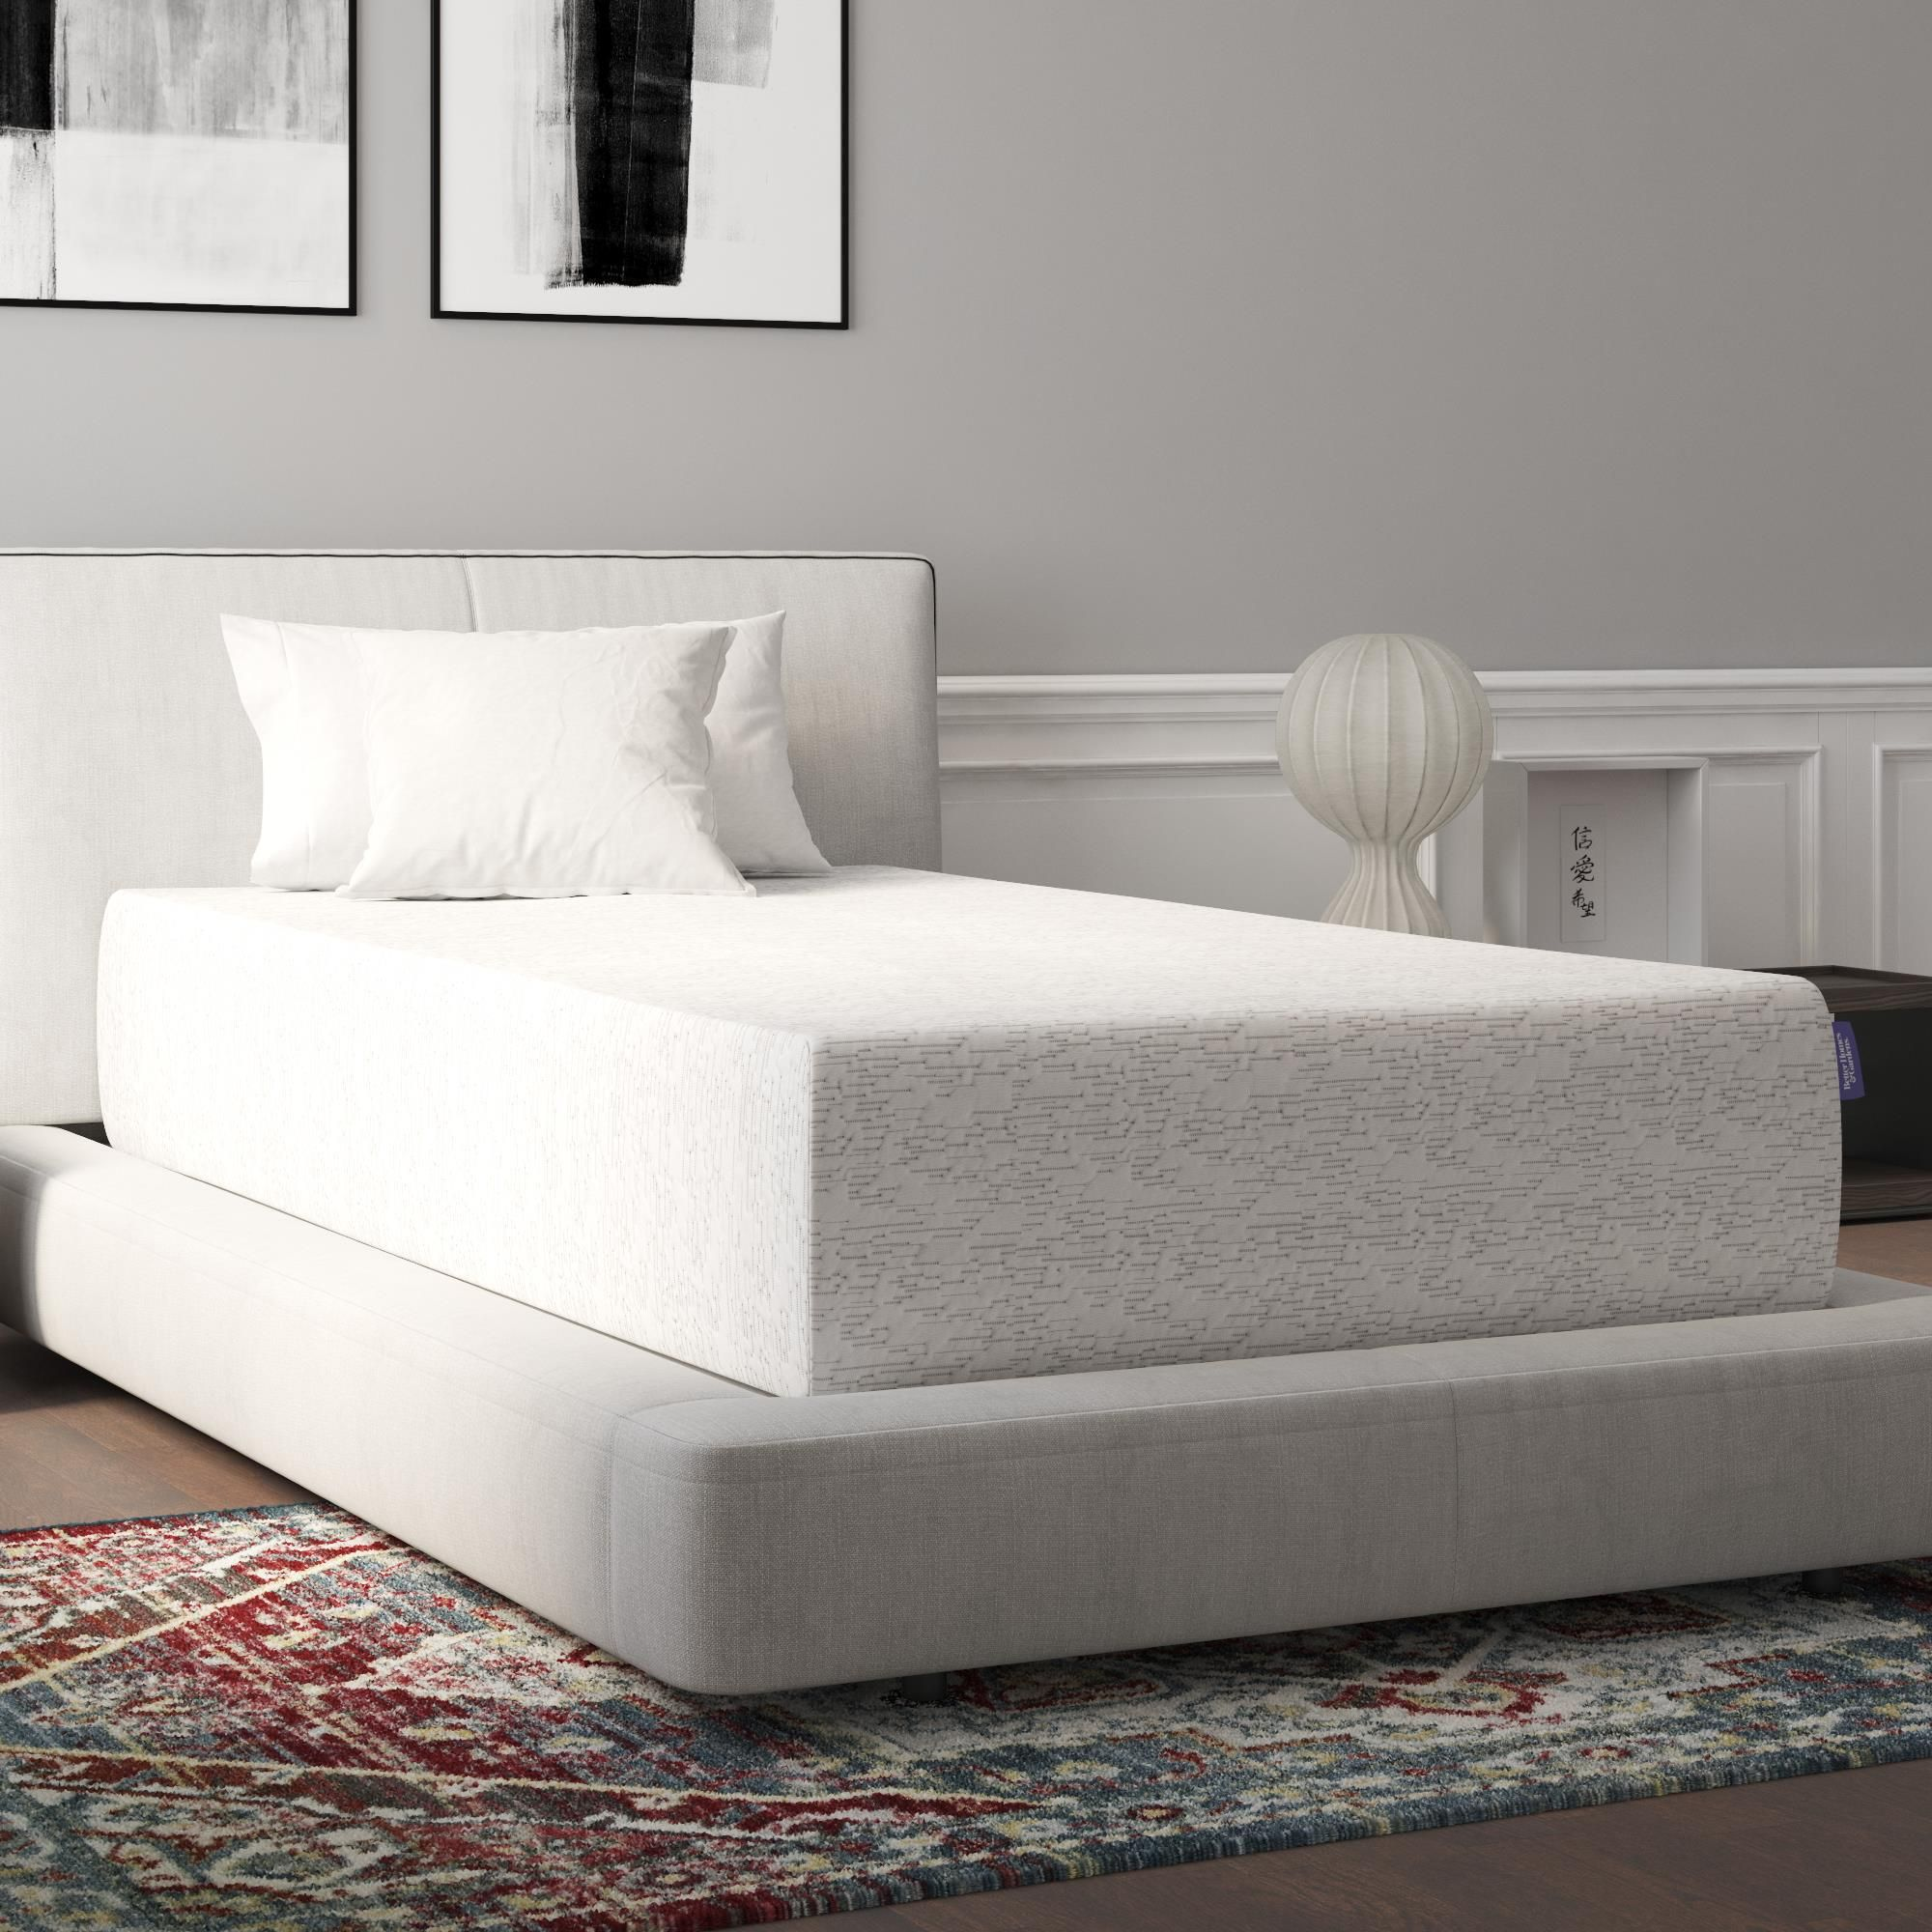 ece251c02a9070810575be820ffba8ee - Better Homes And Gardens 12 Comfort Spring Mattress